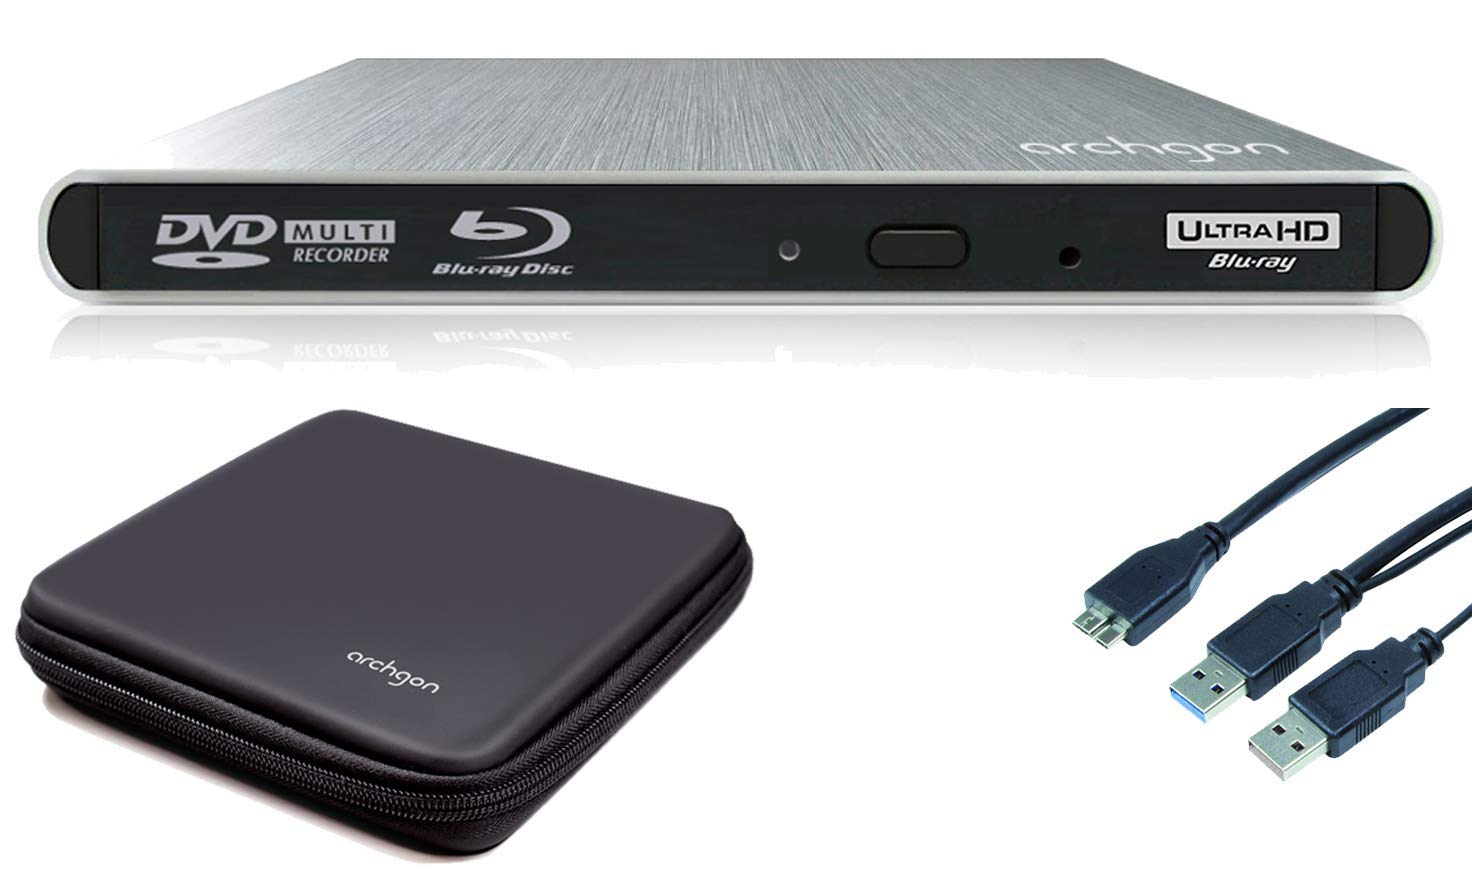 Archgon Style reproductor 4K-UHD externa gravadora e lector de Blu-ray USB 3.0 plateado y caja protectora